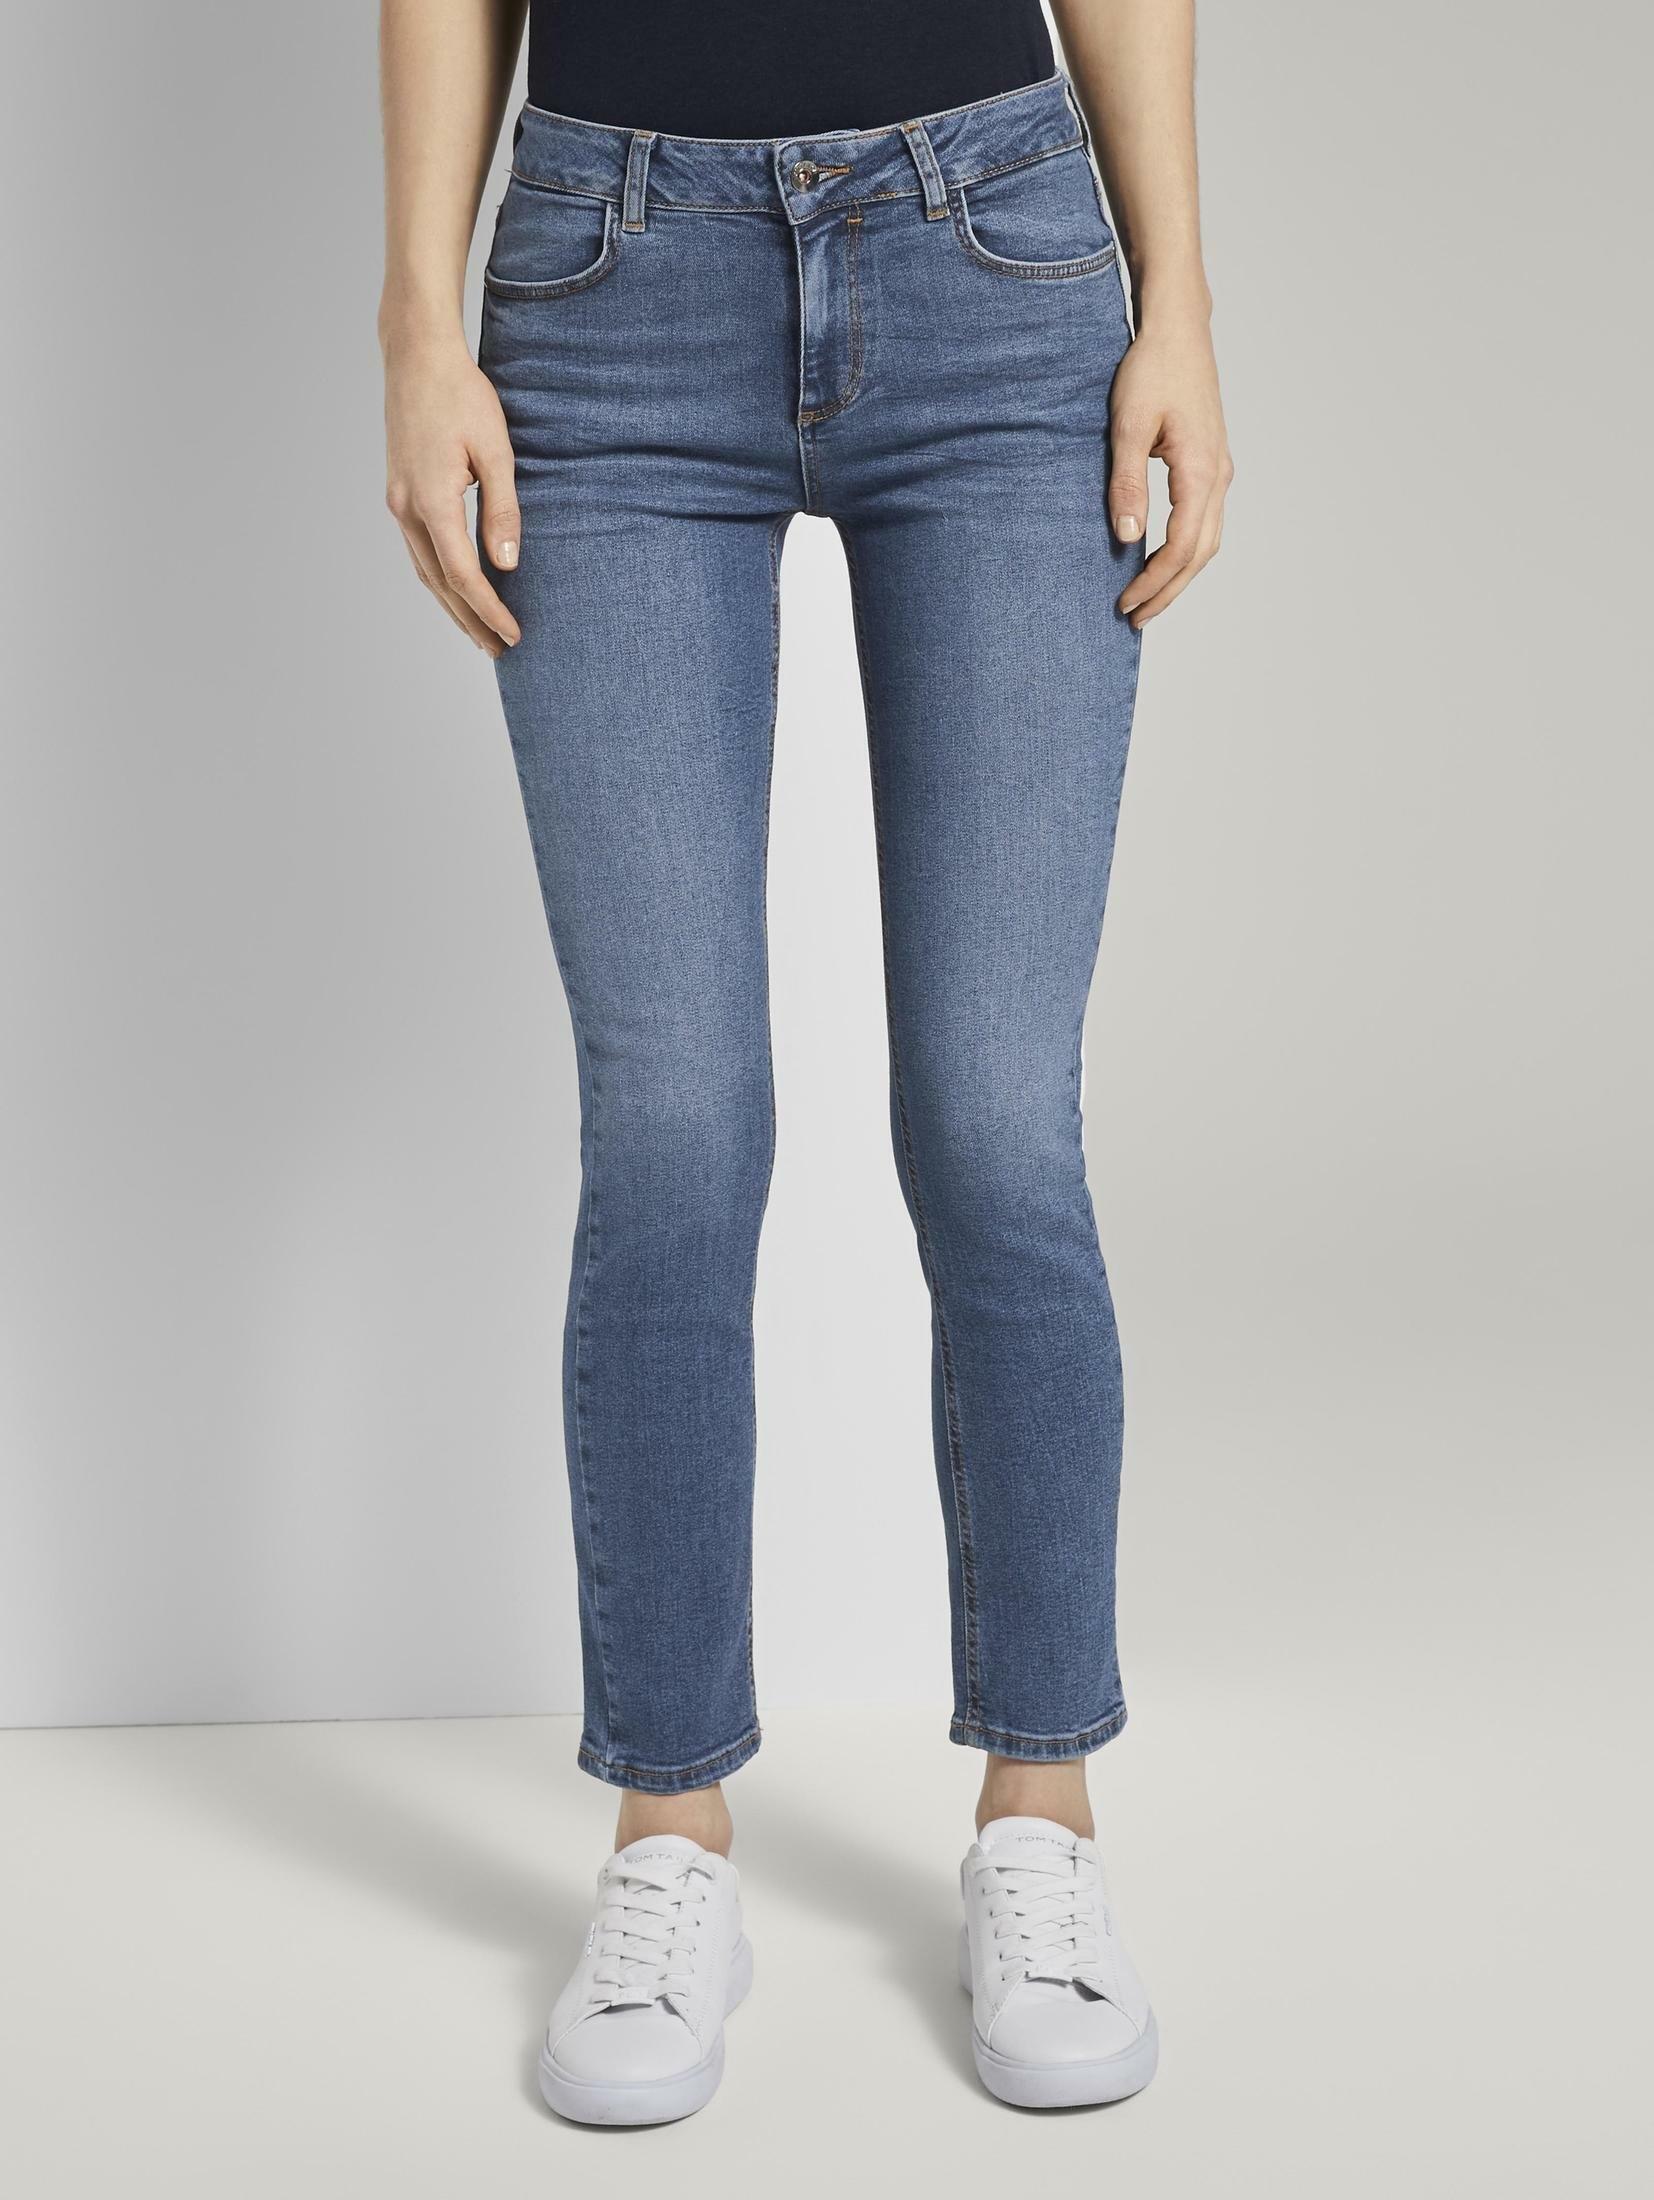 Tom Tailor slim fit jeans »Kate Slim Jeans« bestellen: 30 dagen bedenktijd